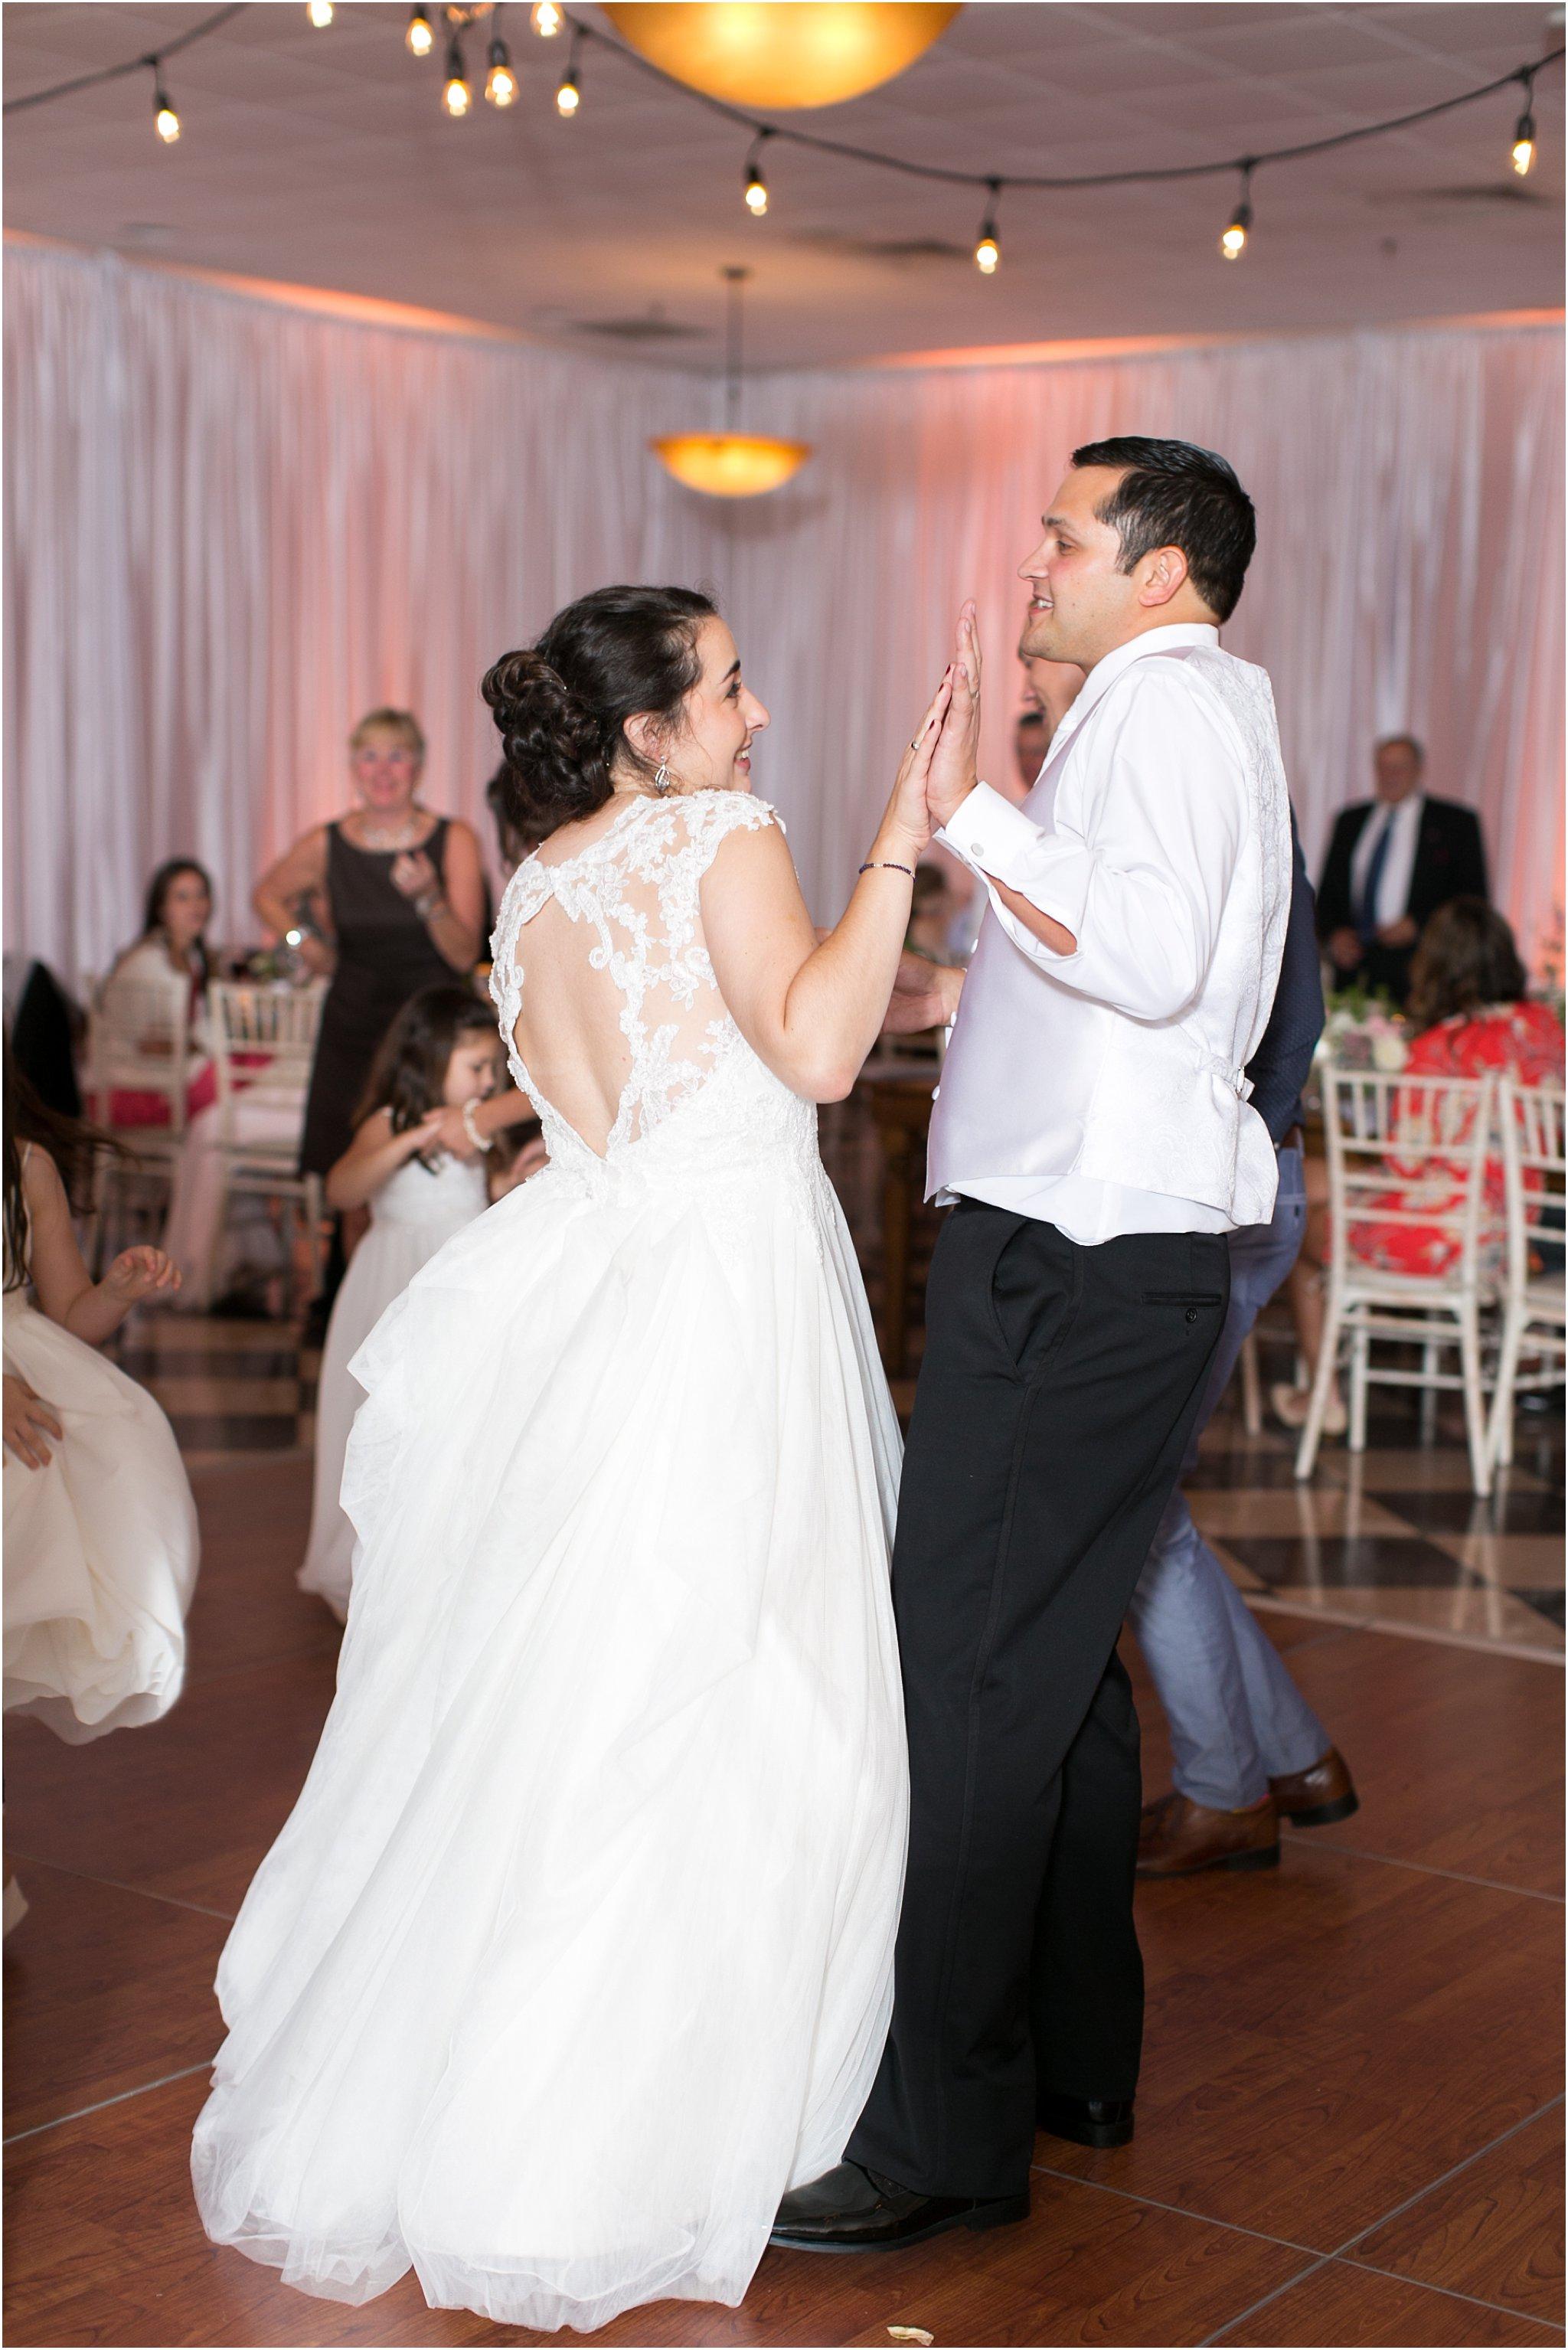 jessica_ryan_photography_virginia_wedding_photographer_wedding_hurricane_norfolk_botanical_gardens_hurricane_matthew_wedding_3640